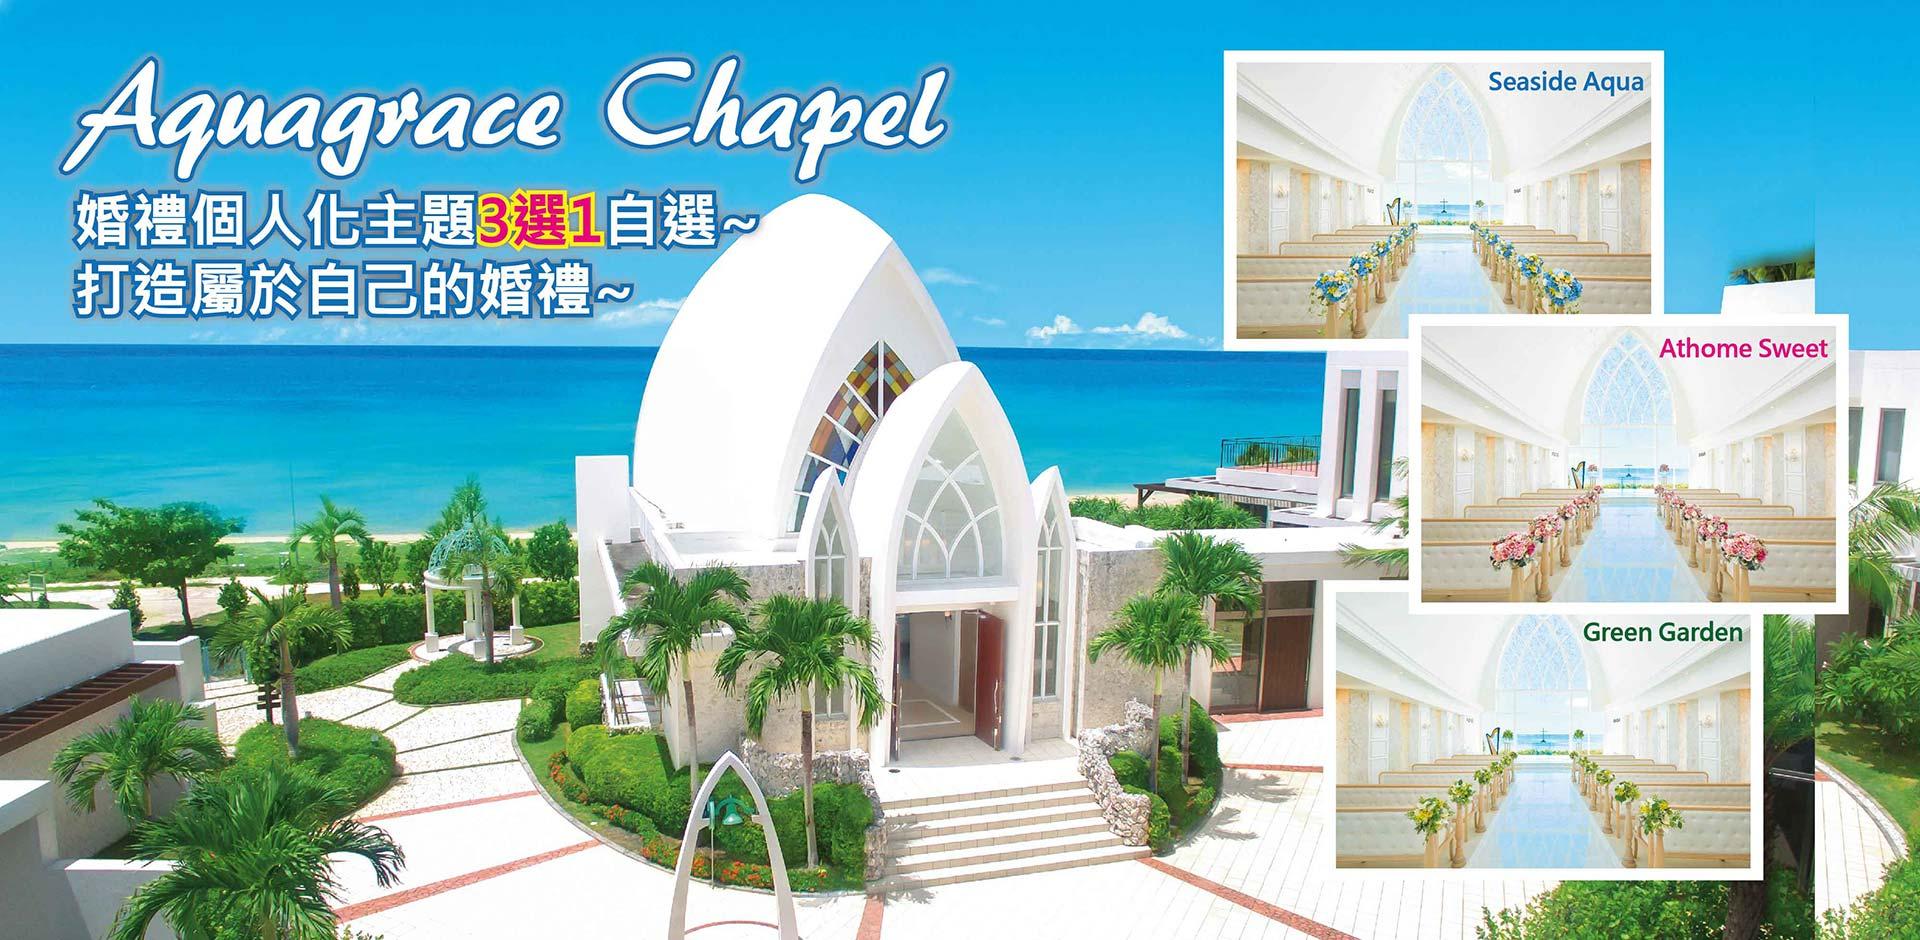 Aquagrace Chapel 婚禮個人化主題3選1自選~ 打造屬於自己的婚禮~